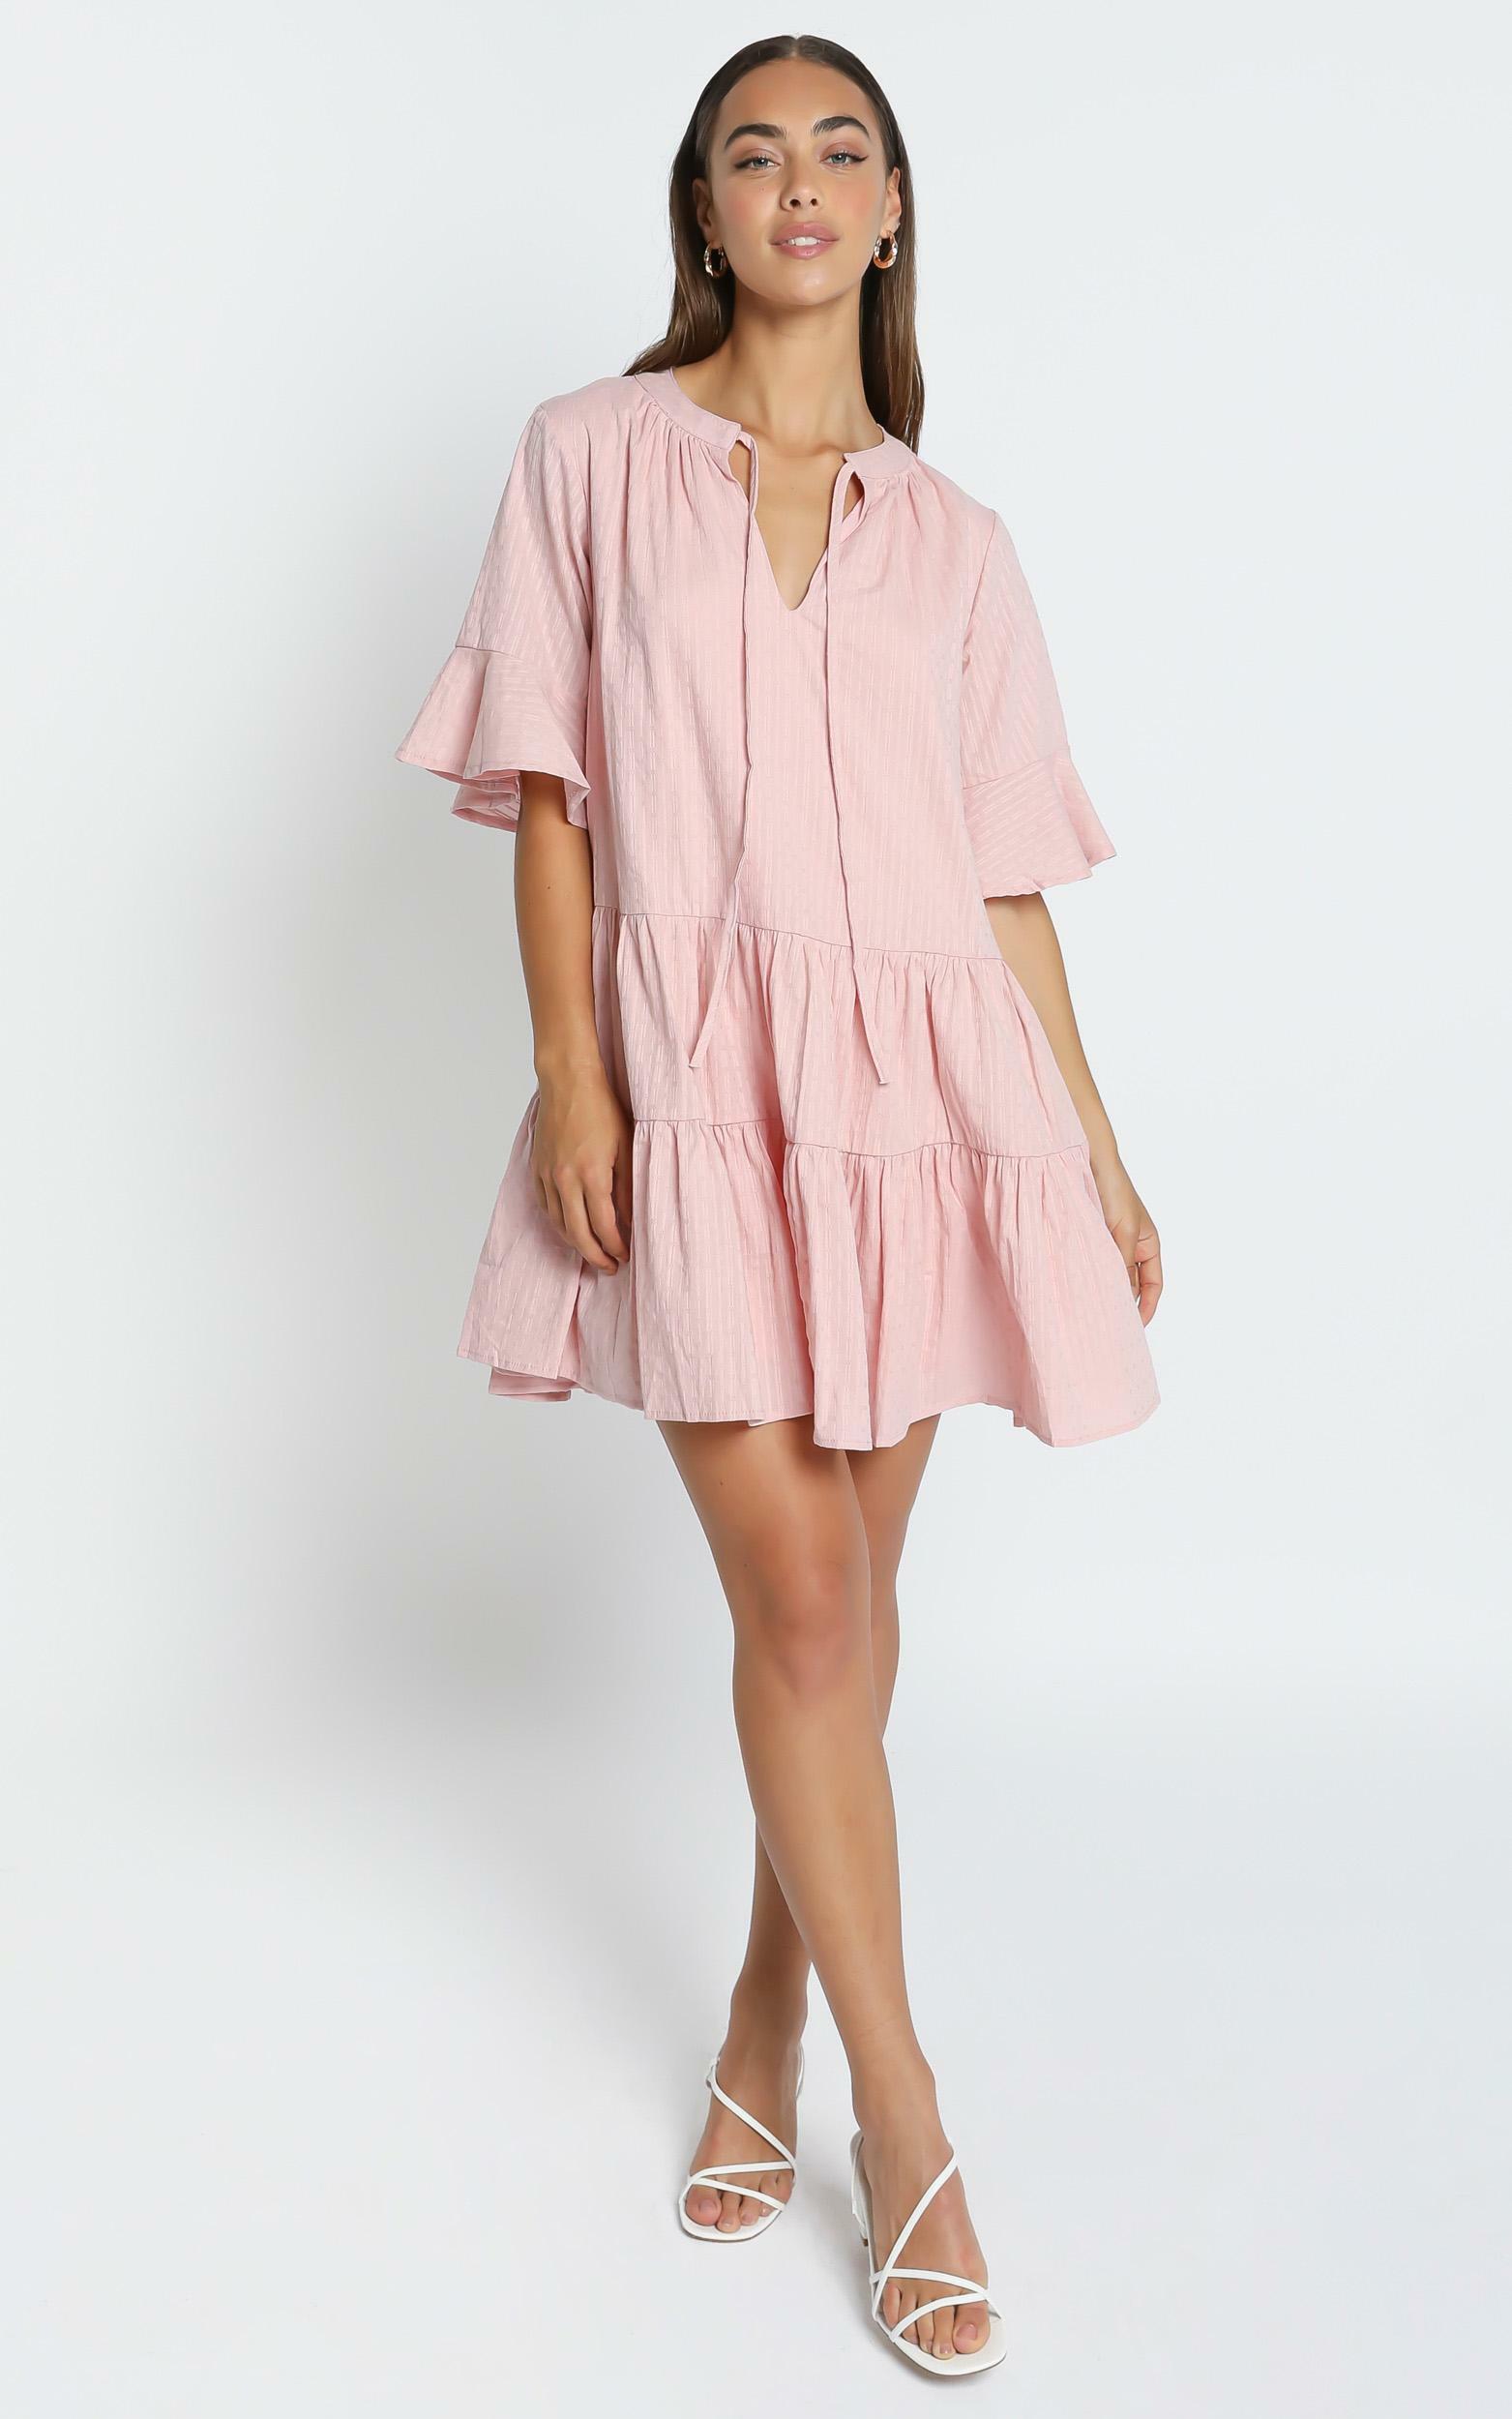 Best Memories Dress in Pink - 06, PNK3, hi-res image number null